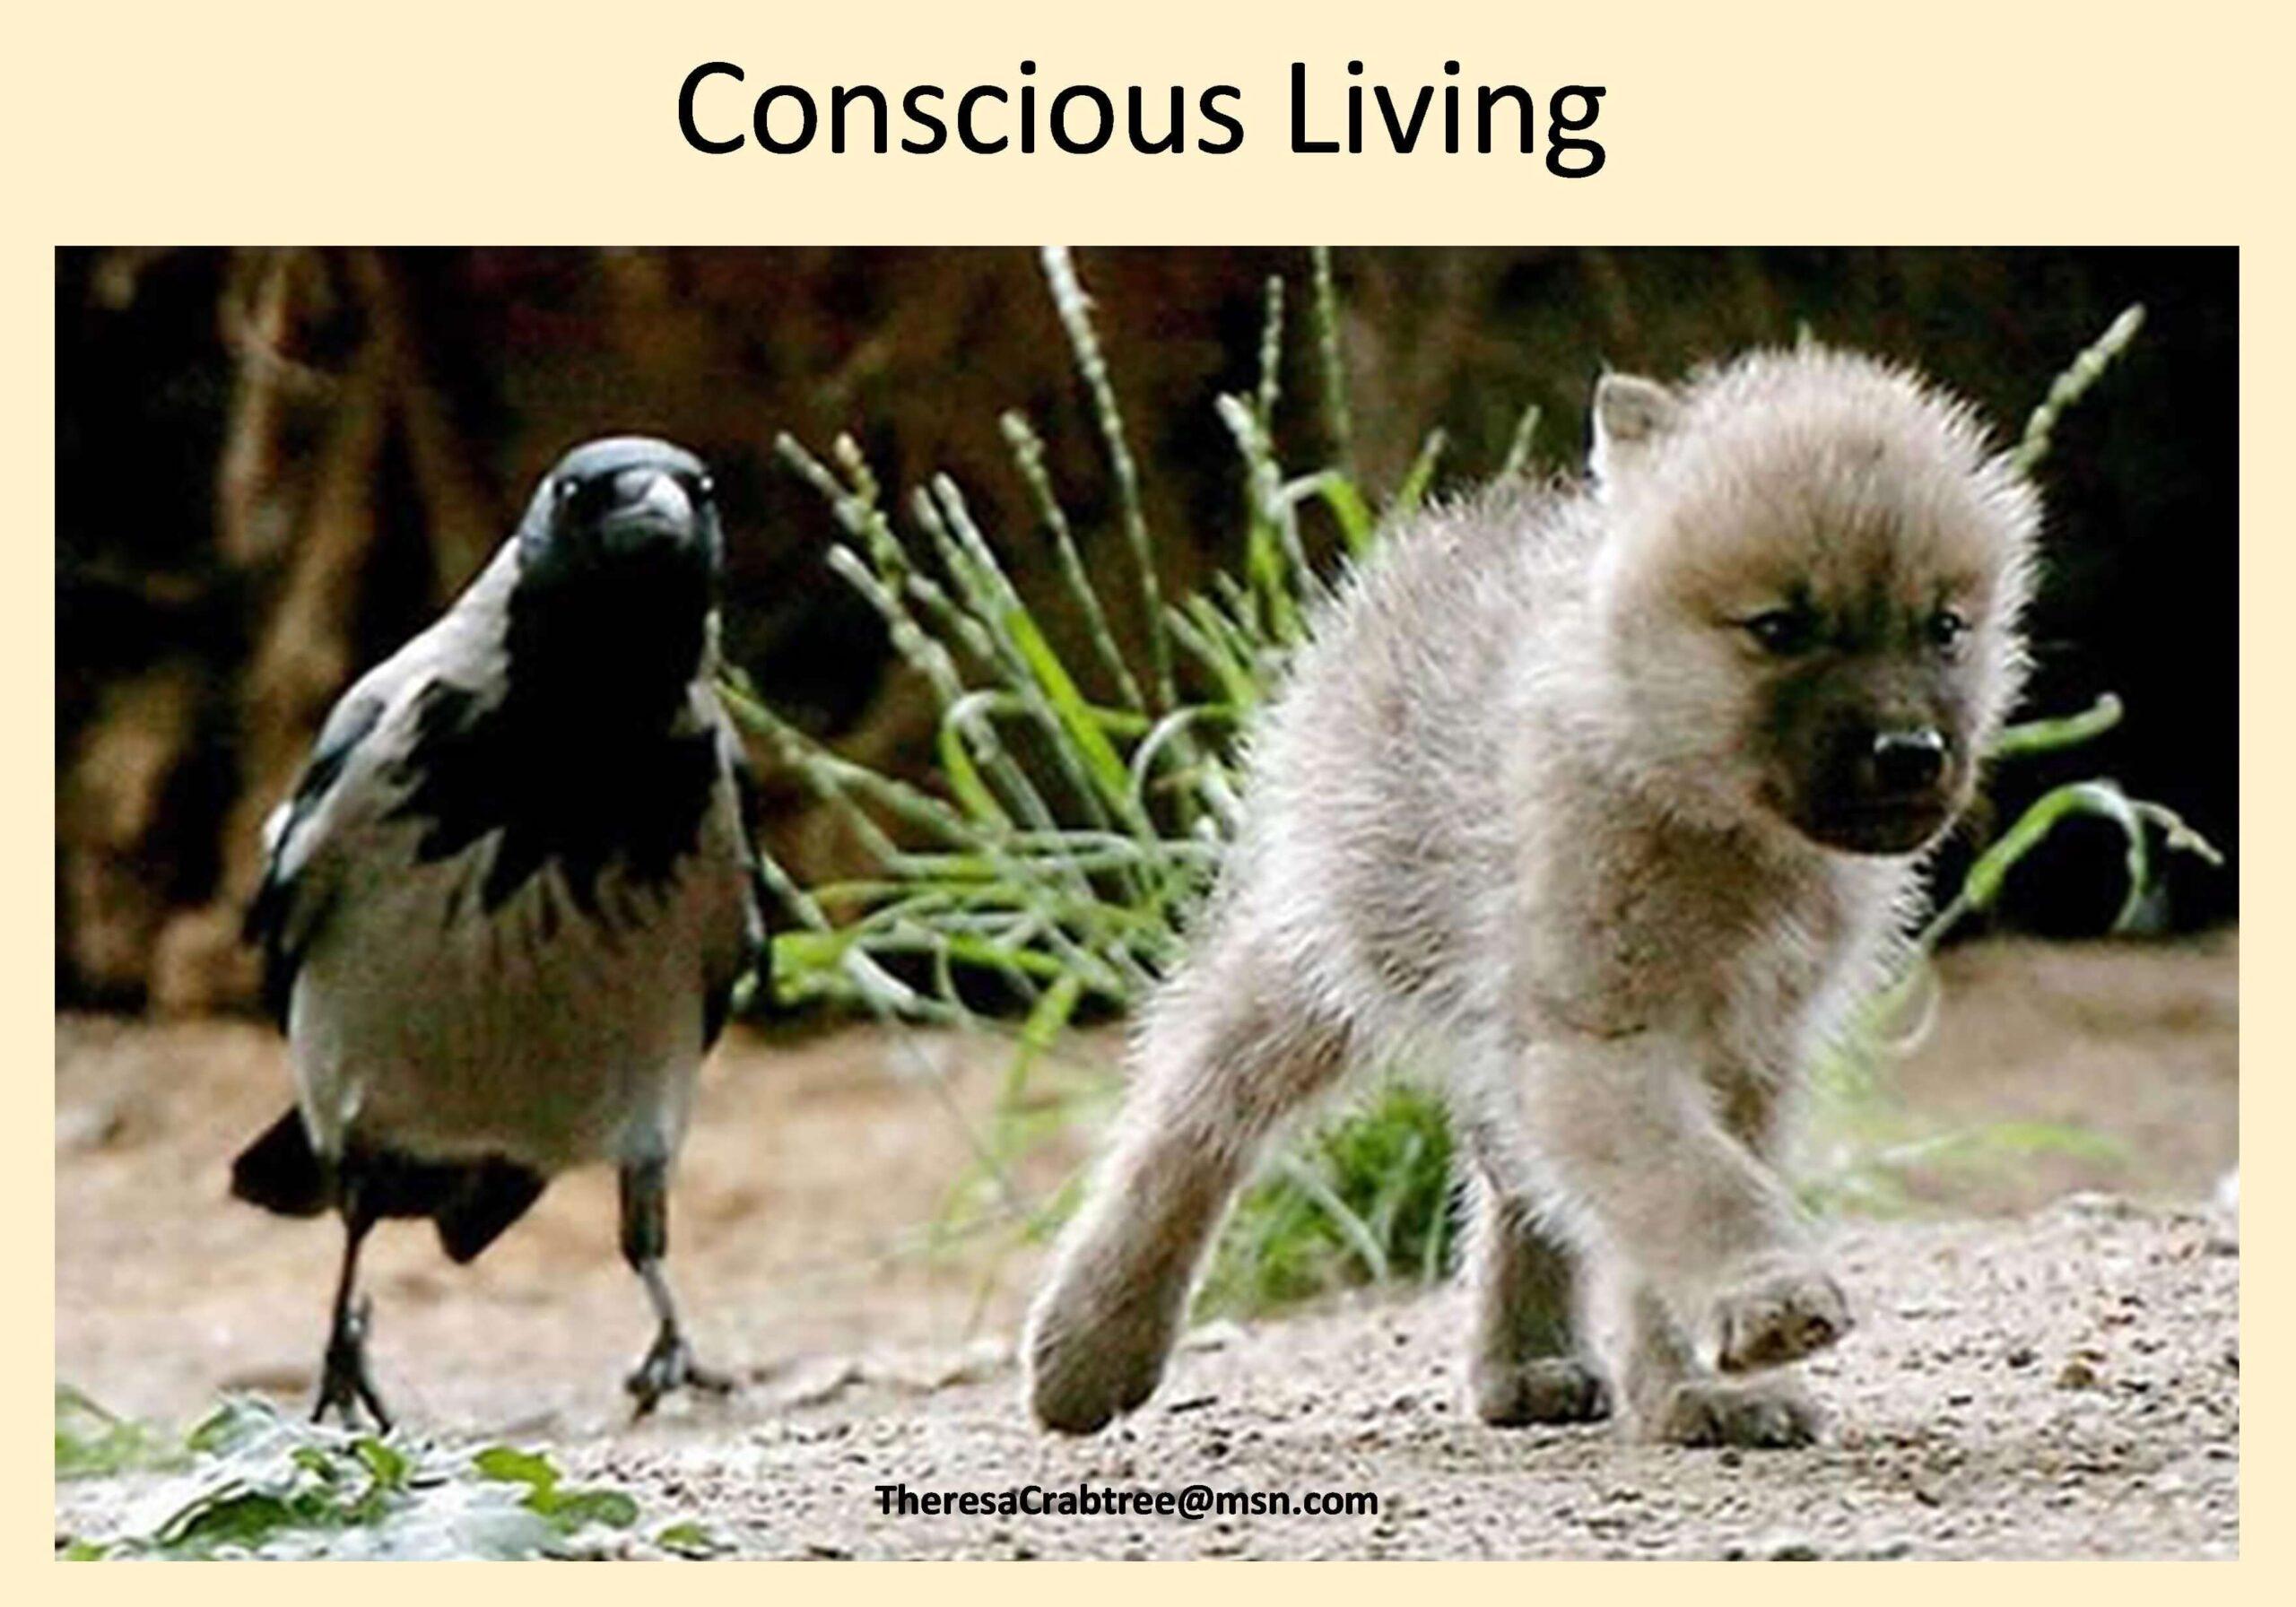 Conscious Living: Video